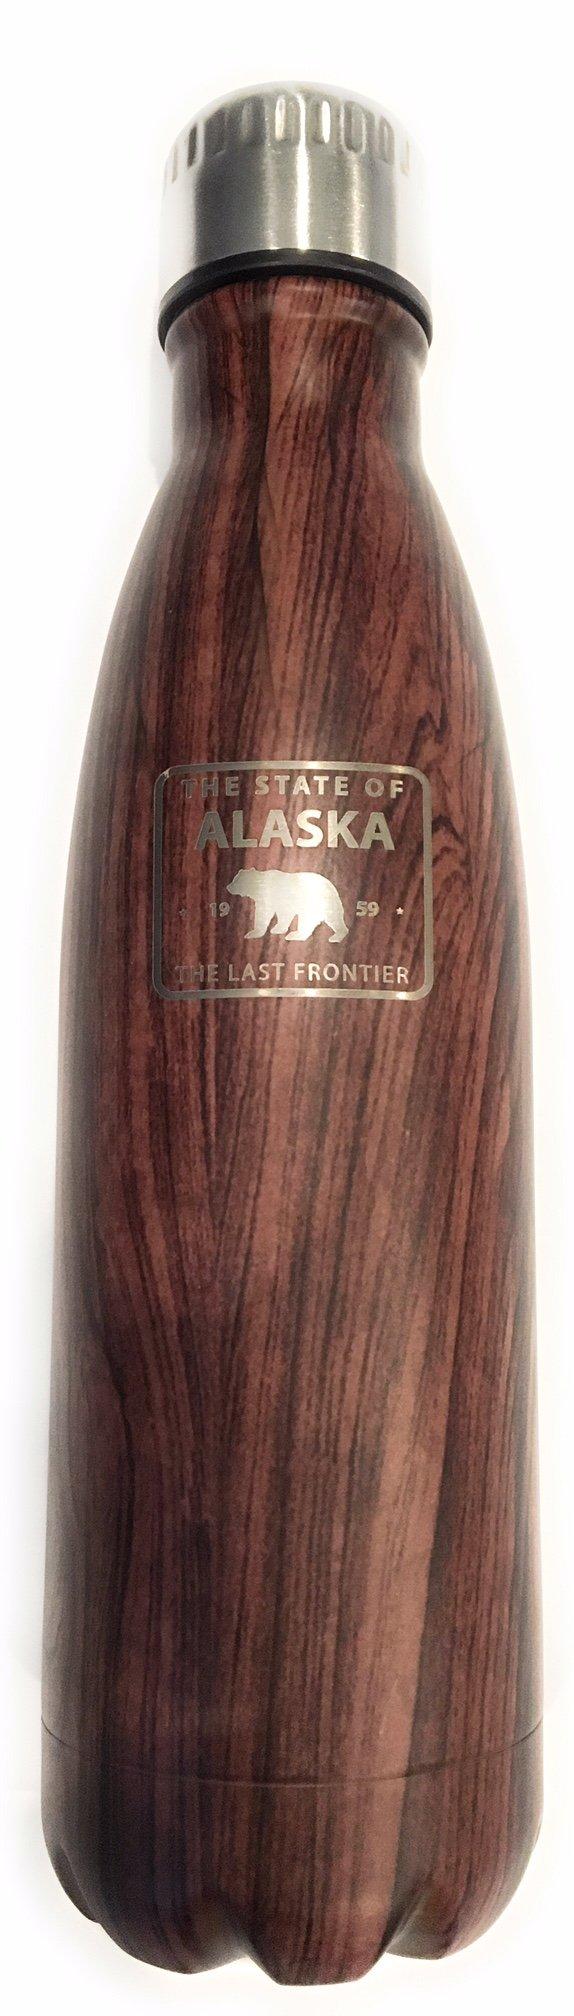 Alaska Last Frontier Insulated Woodgrain Stainless Steel Water Bottle - 16 ounces